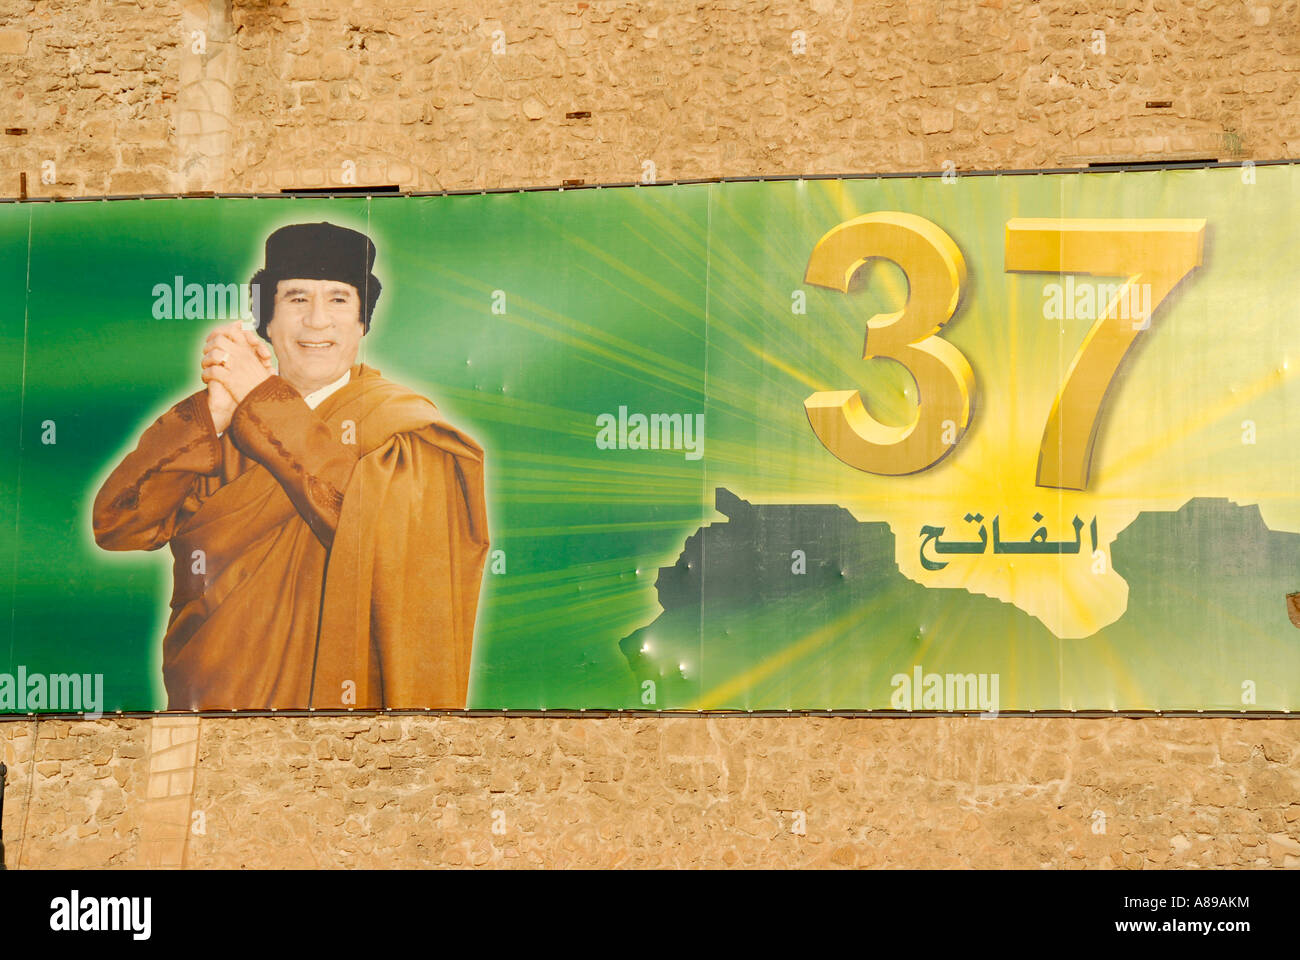 Bill of Muammar al Gaddafi as victor since 37 years Green Square Tripolis Libya - Stock Image